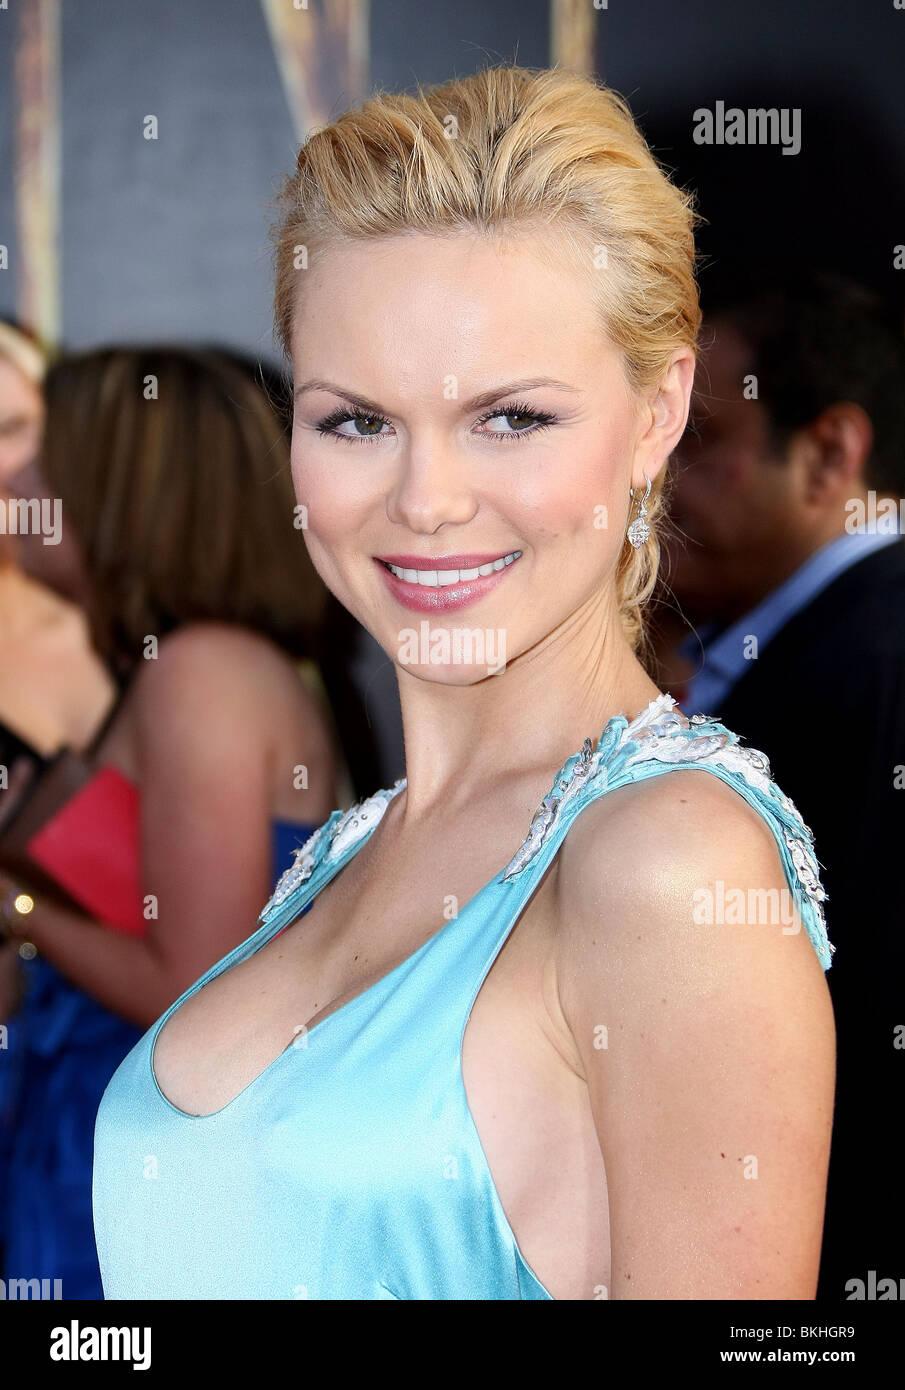 ANYA MONZIKOVA WORLDWIDE PREMIERE OF IRON MAN 2 HOLLYWOOD LOS ANGELES CA 26 April 2010 - Stock Image